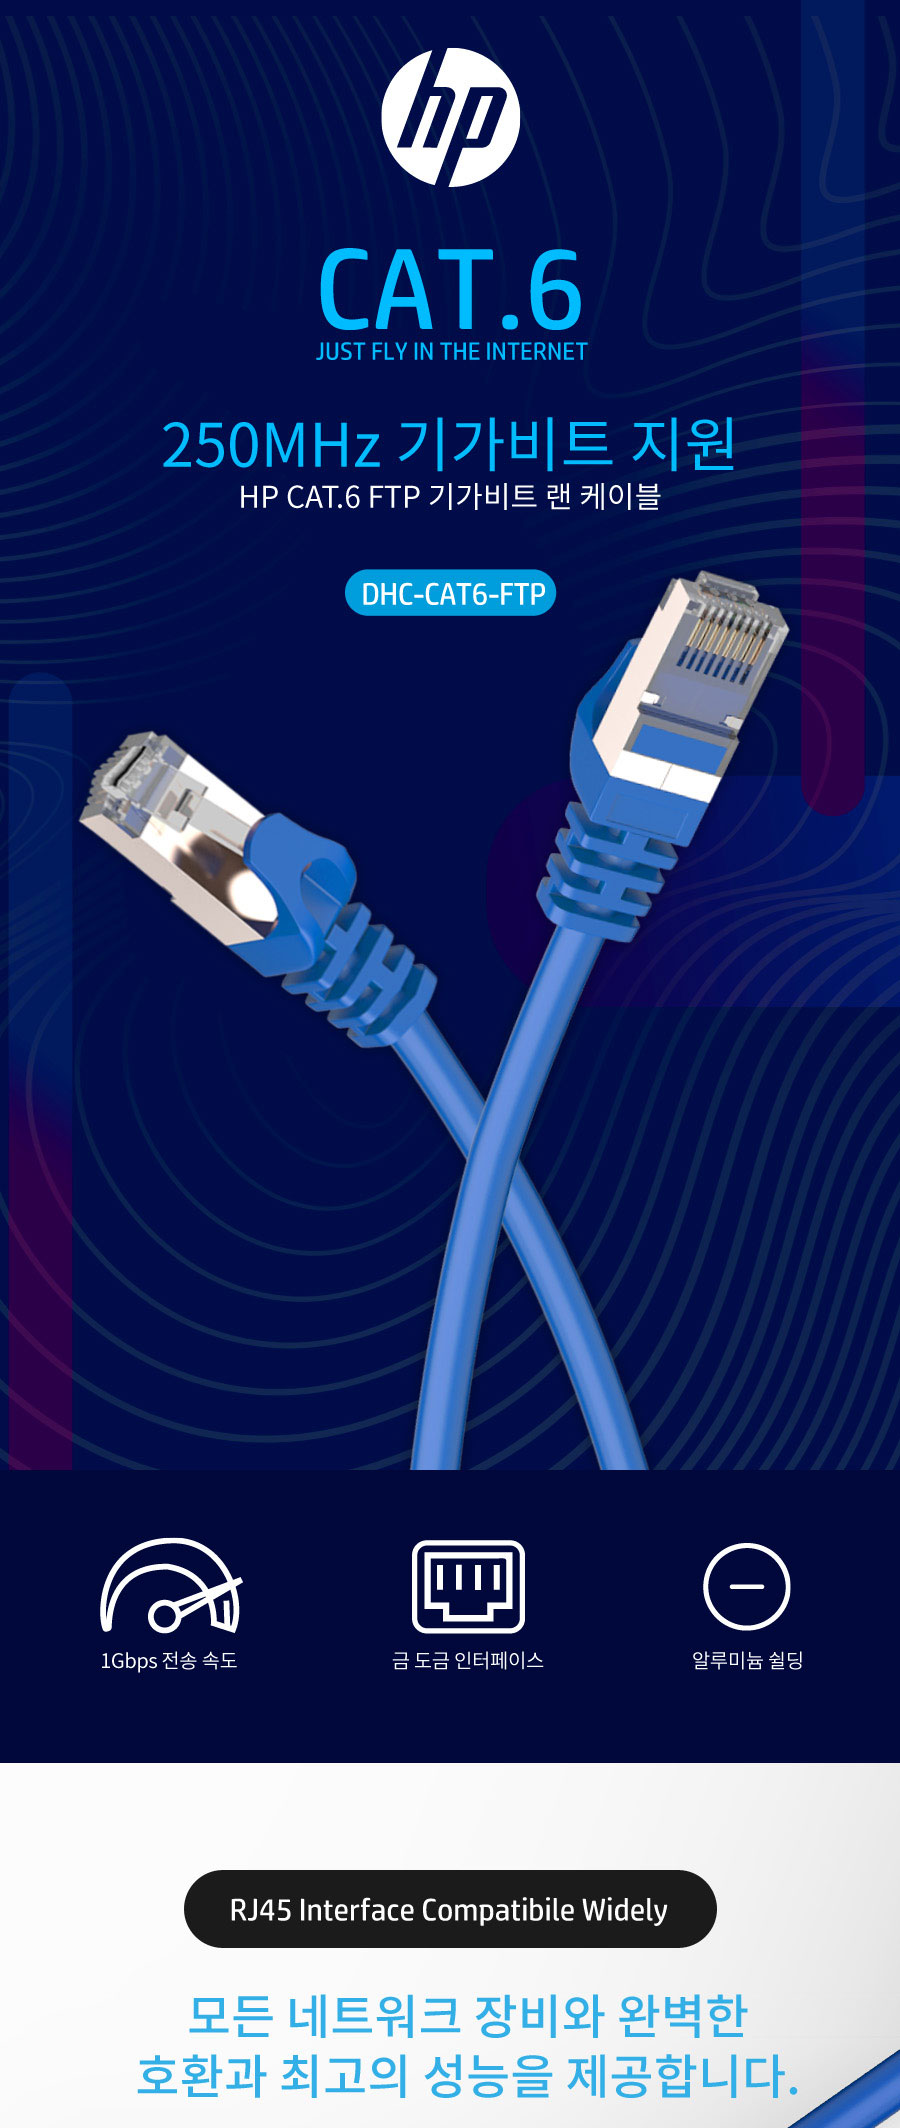 HP DHC-CAT6-FTP CAT.6 FTP 랜케이블 (2m)